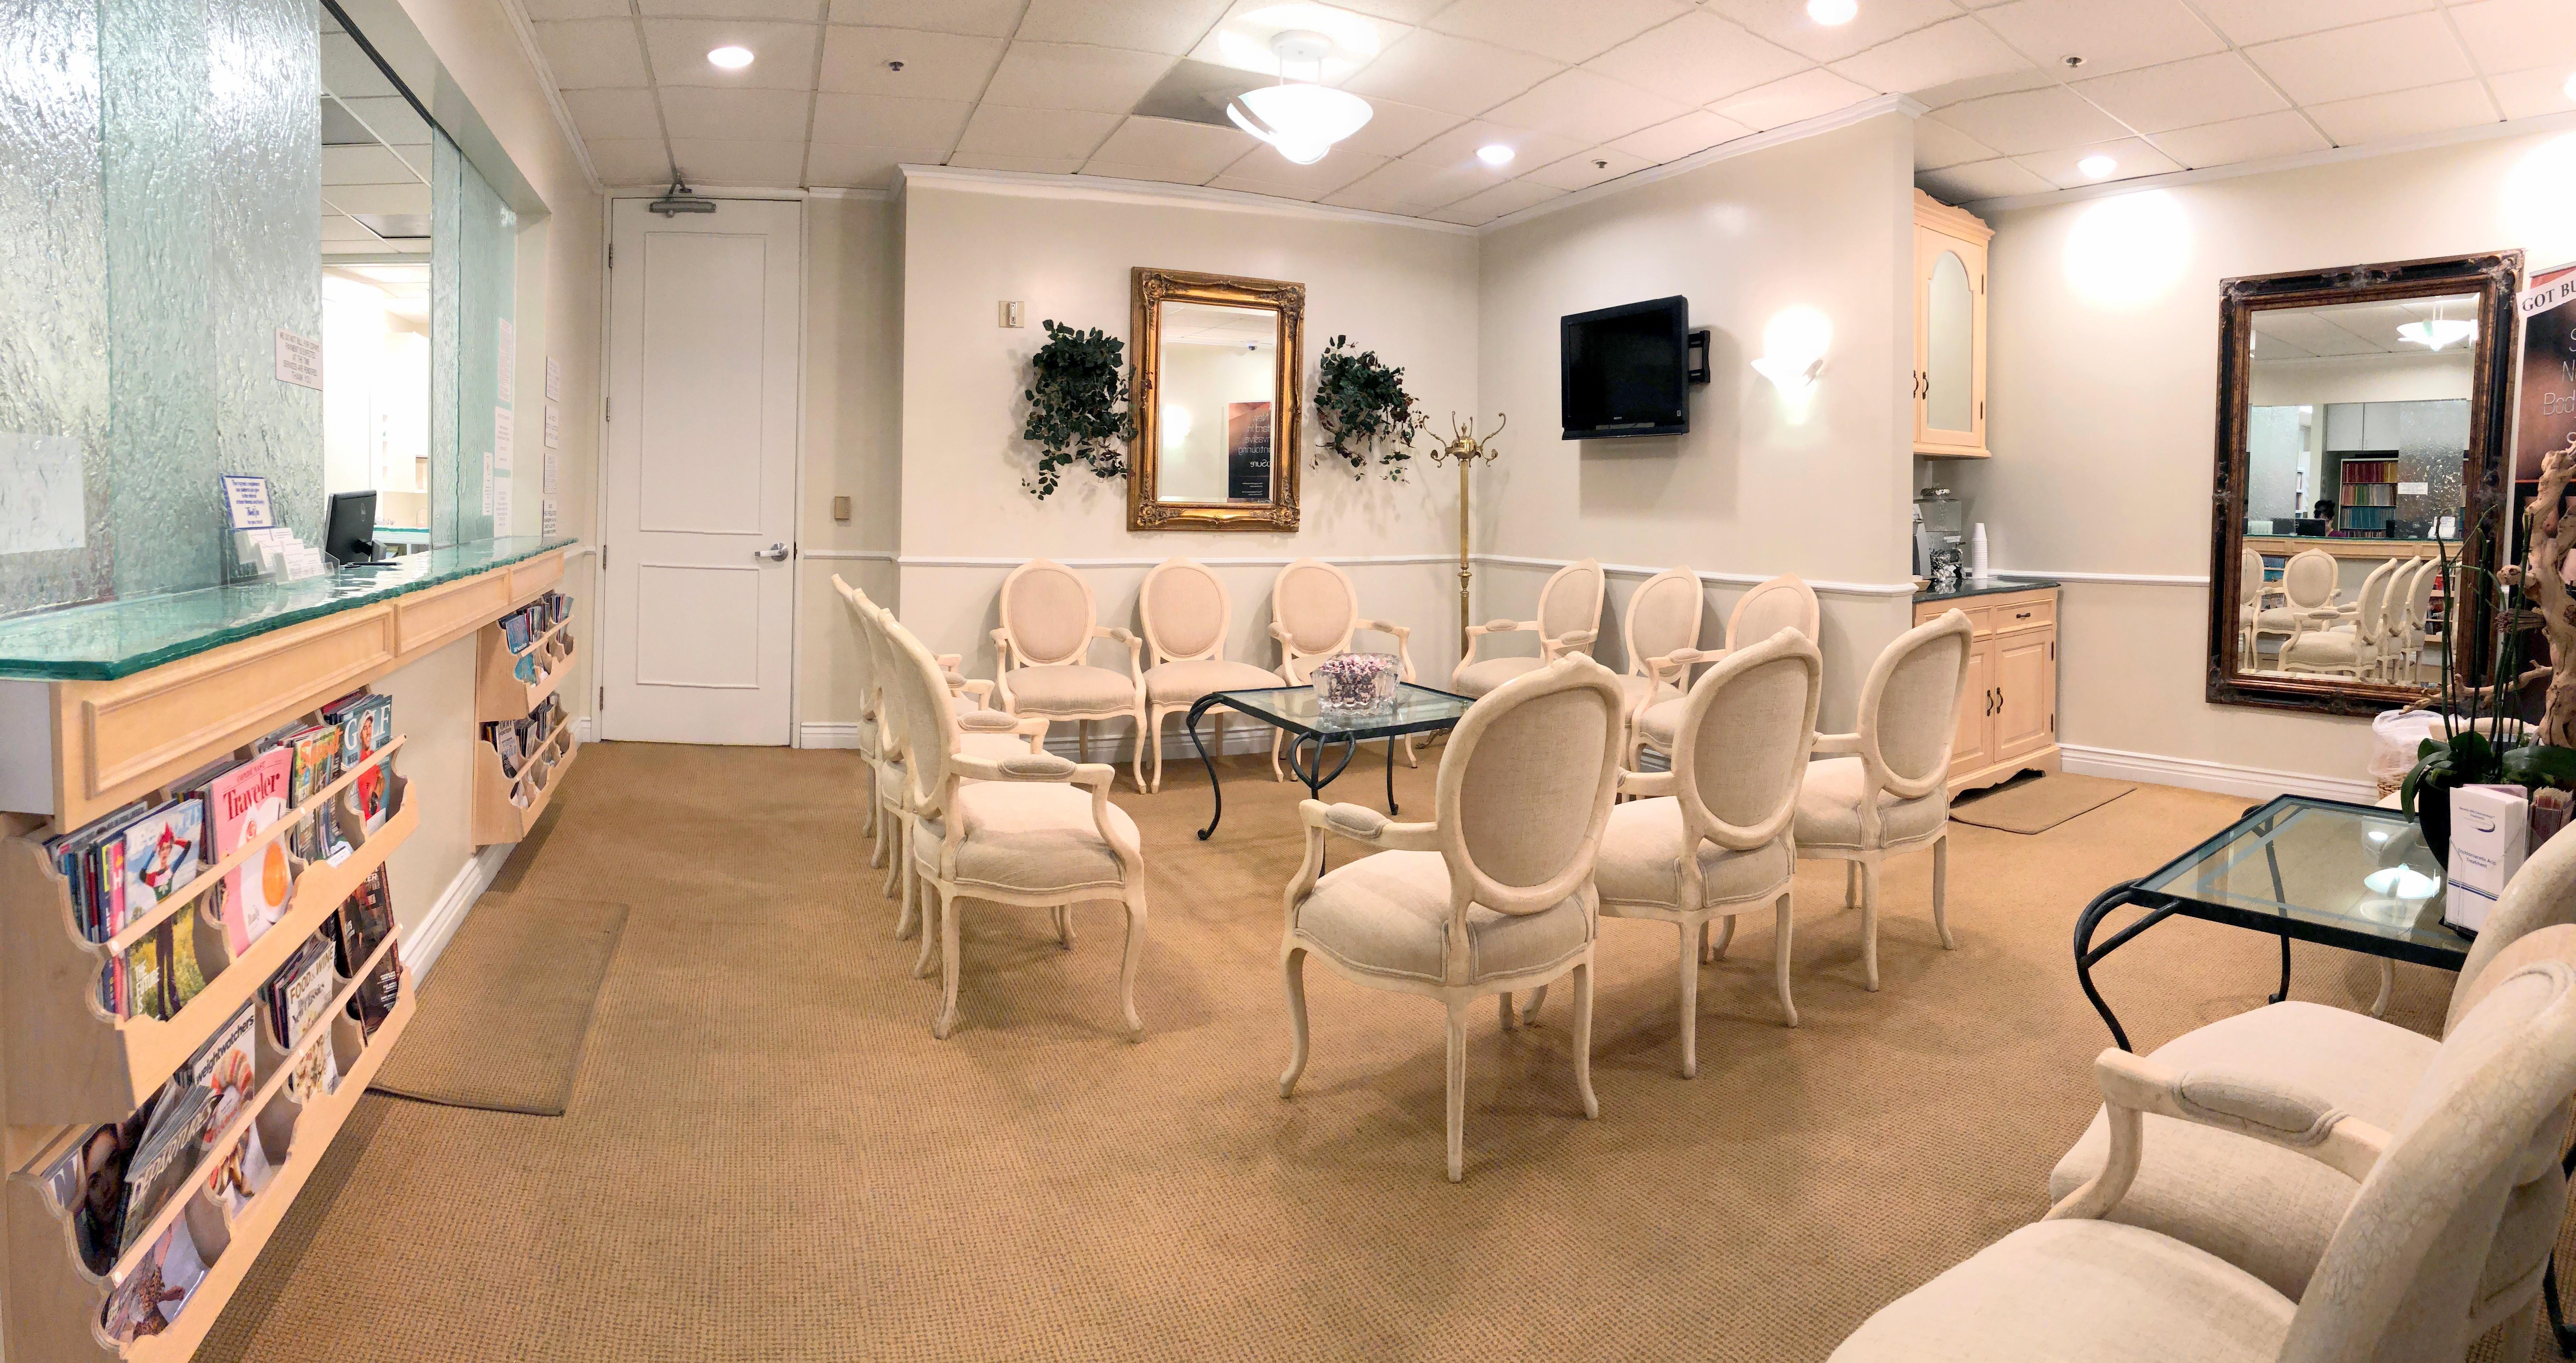 Beverly Hills Dermatology Consultants | LinkedIn